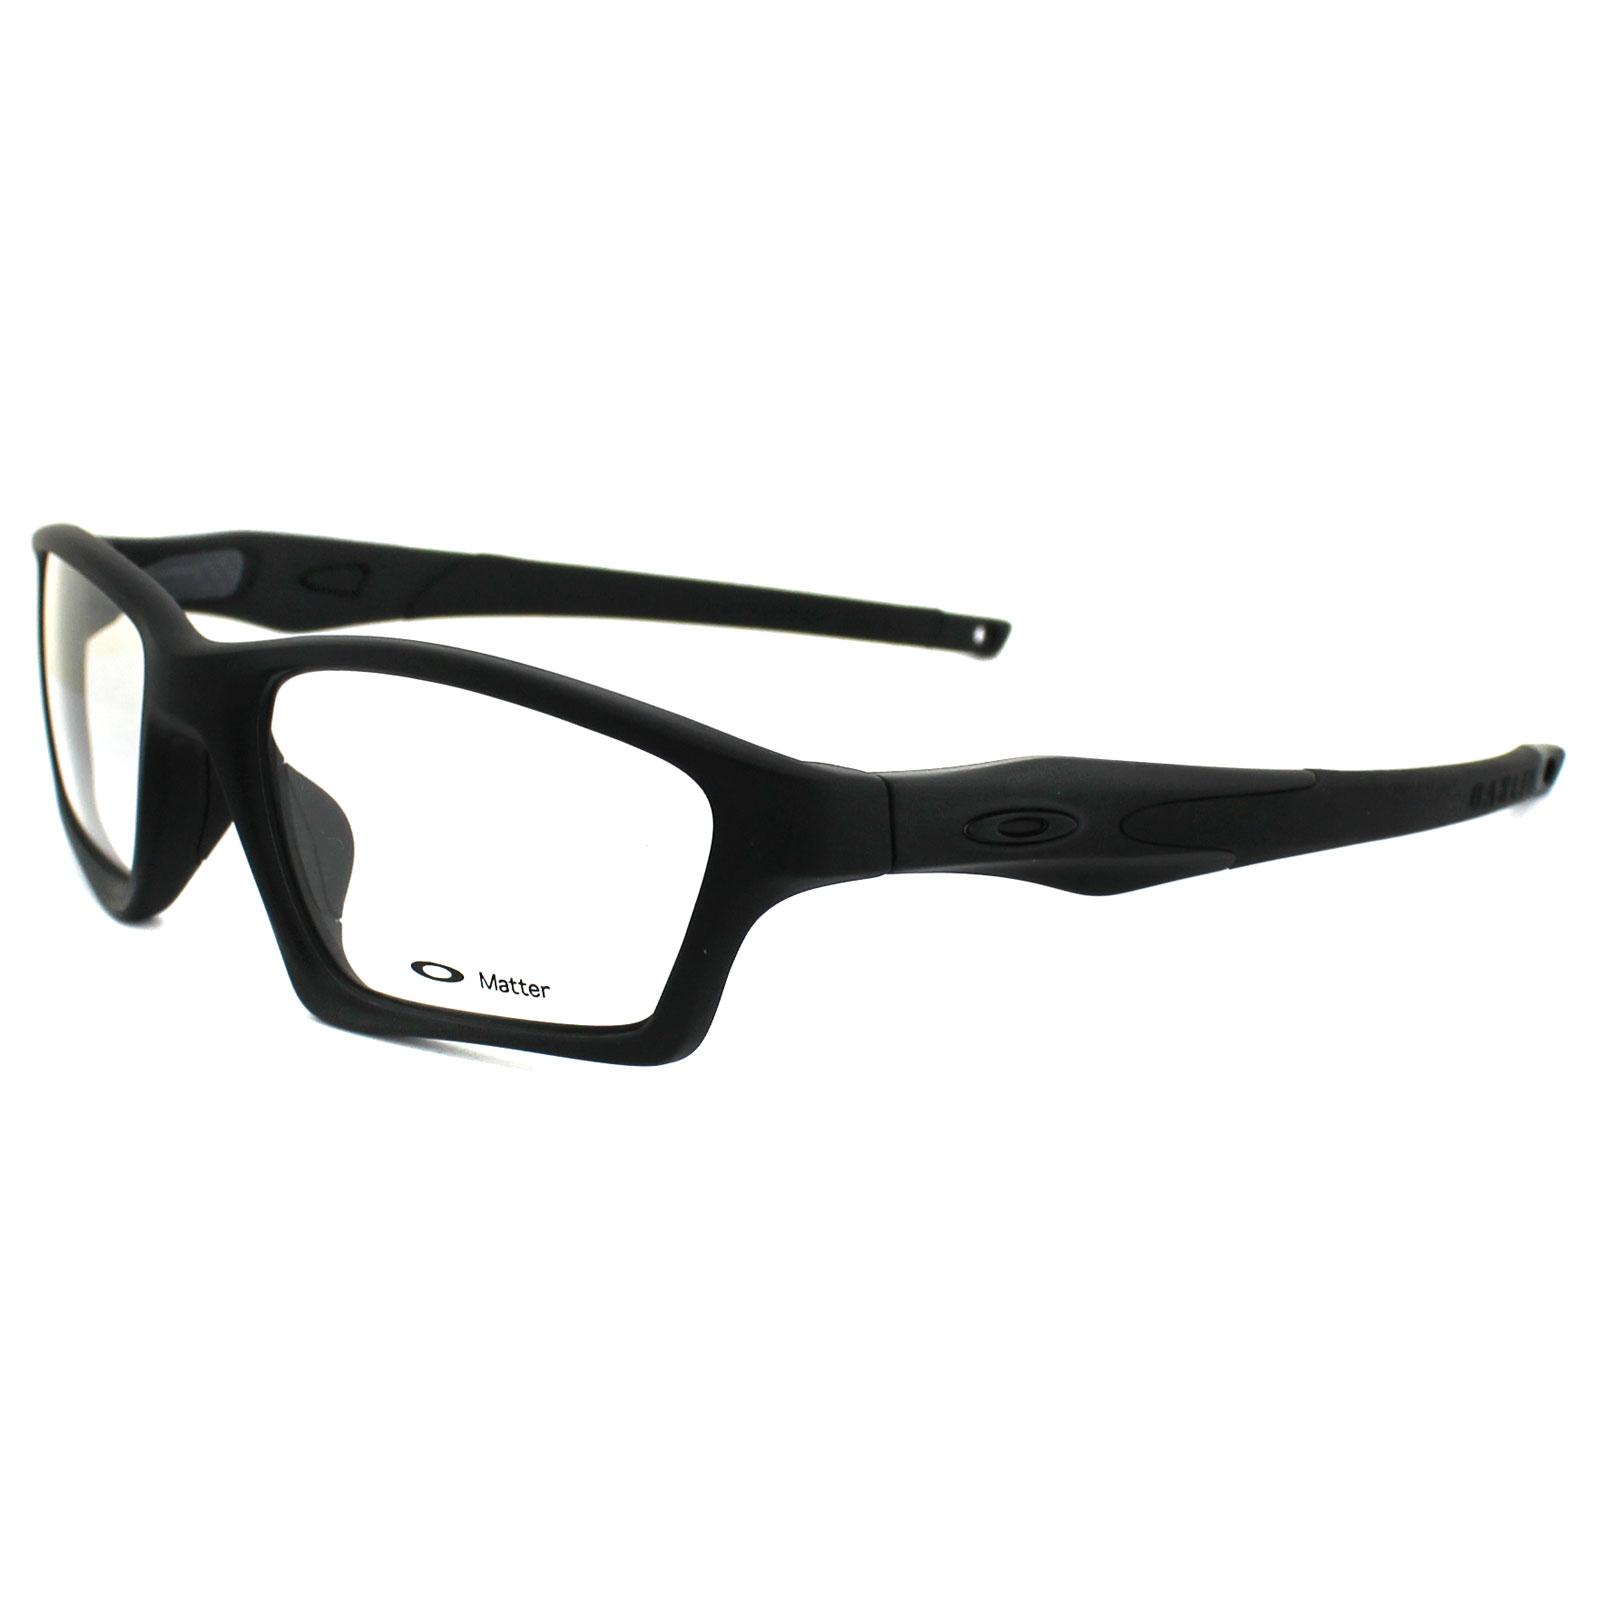 5f677fd8765 switzerland oakley crosslink sunglasses repair 69826 6050e